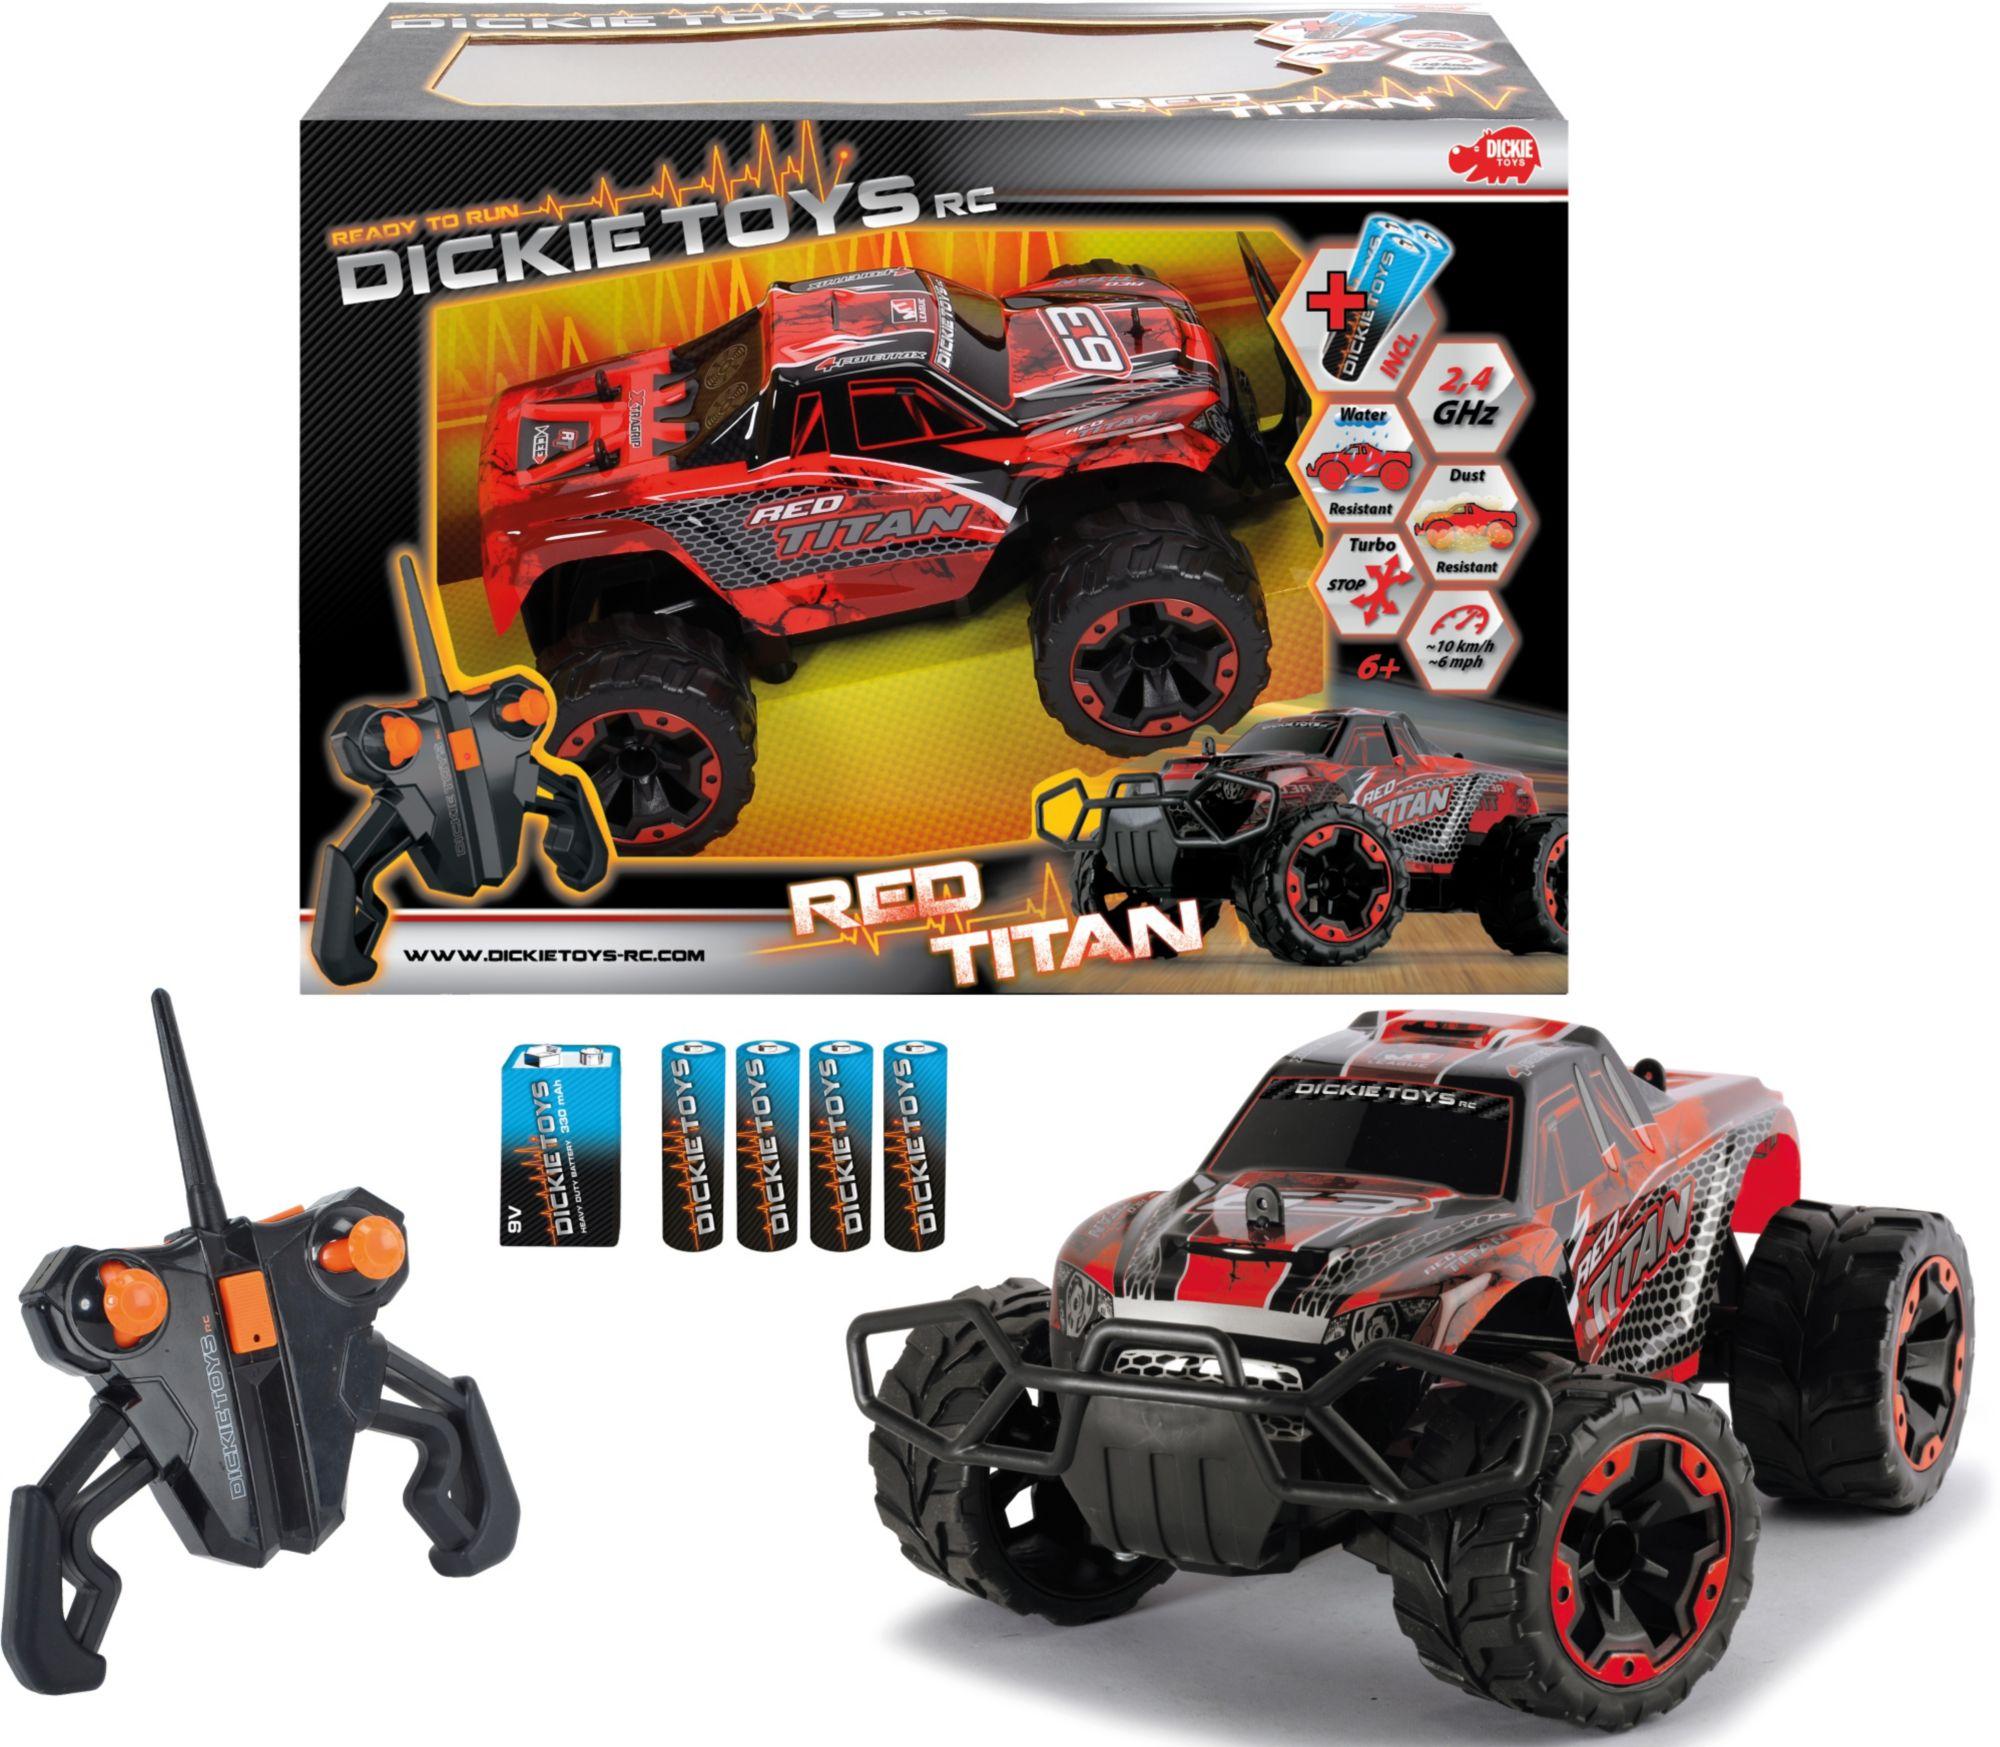 DICKIE TOYS Dickie Toys RC Komplett Set, »Red Titan 2,4 GHz 1:16«